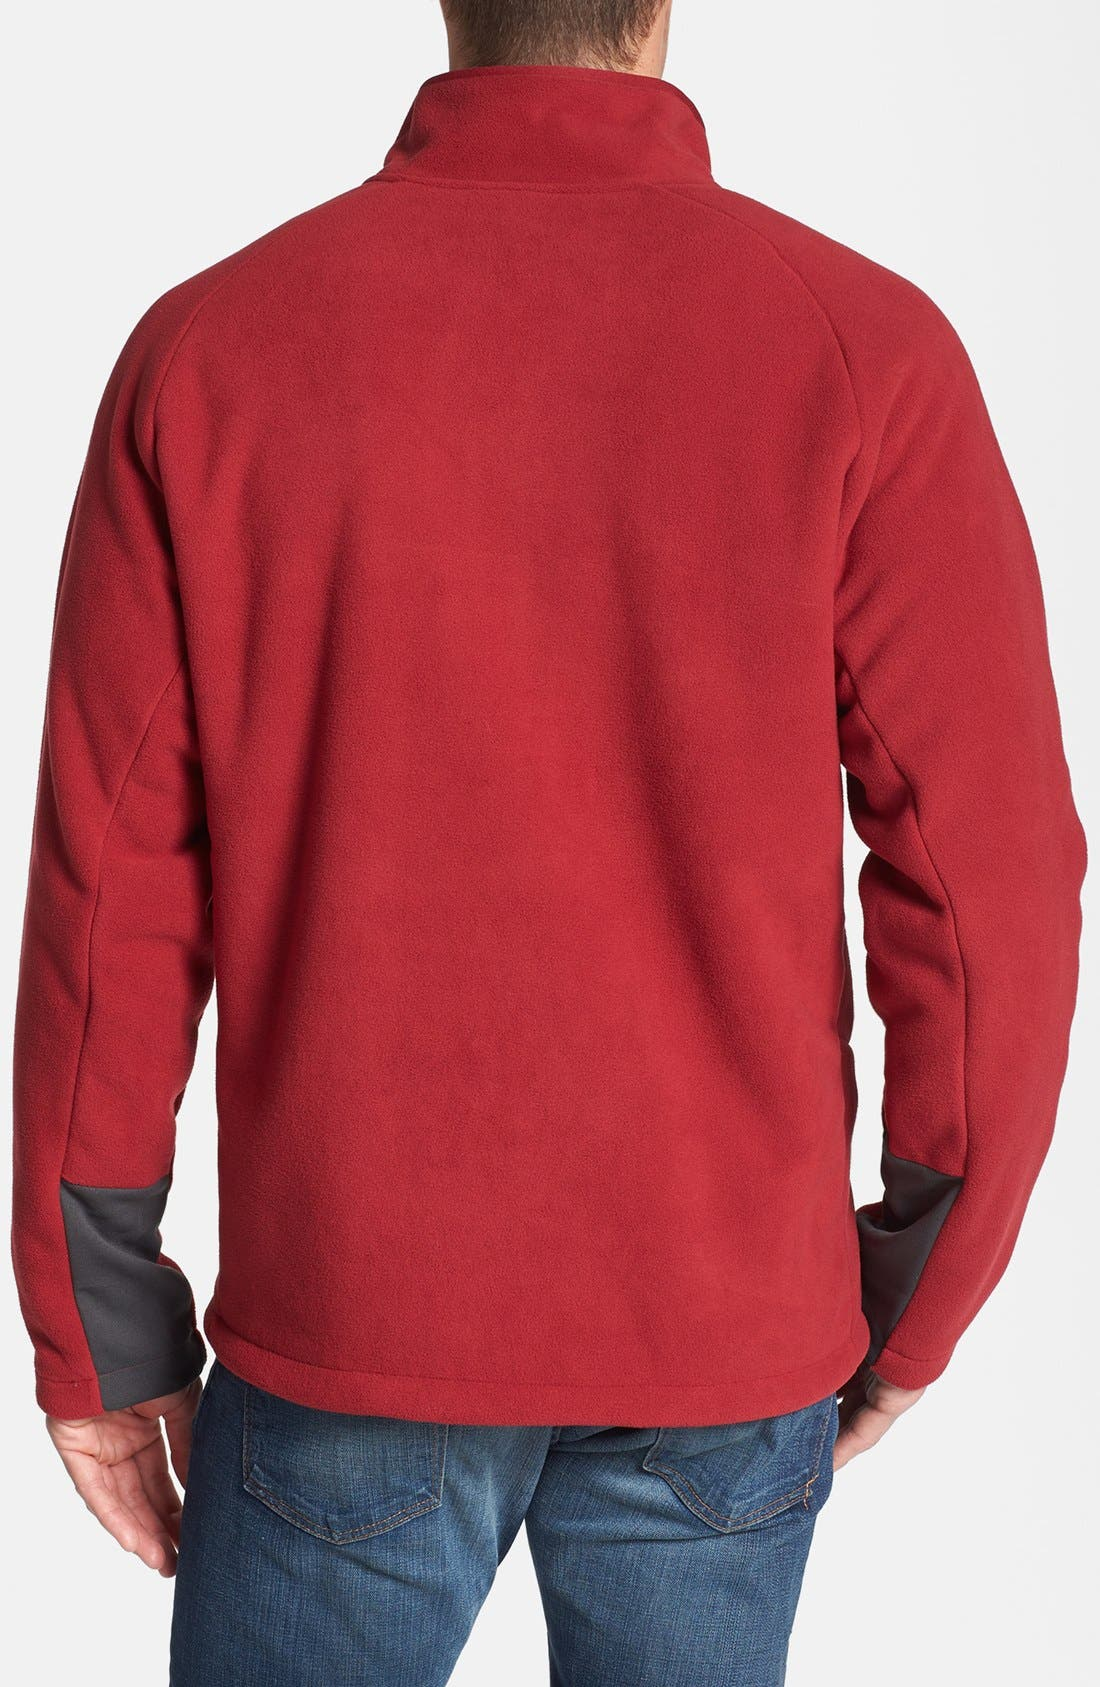 'Chimborazo' Zip Front Fleece Jacket,                             Alternate thumbnail 23, color,